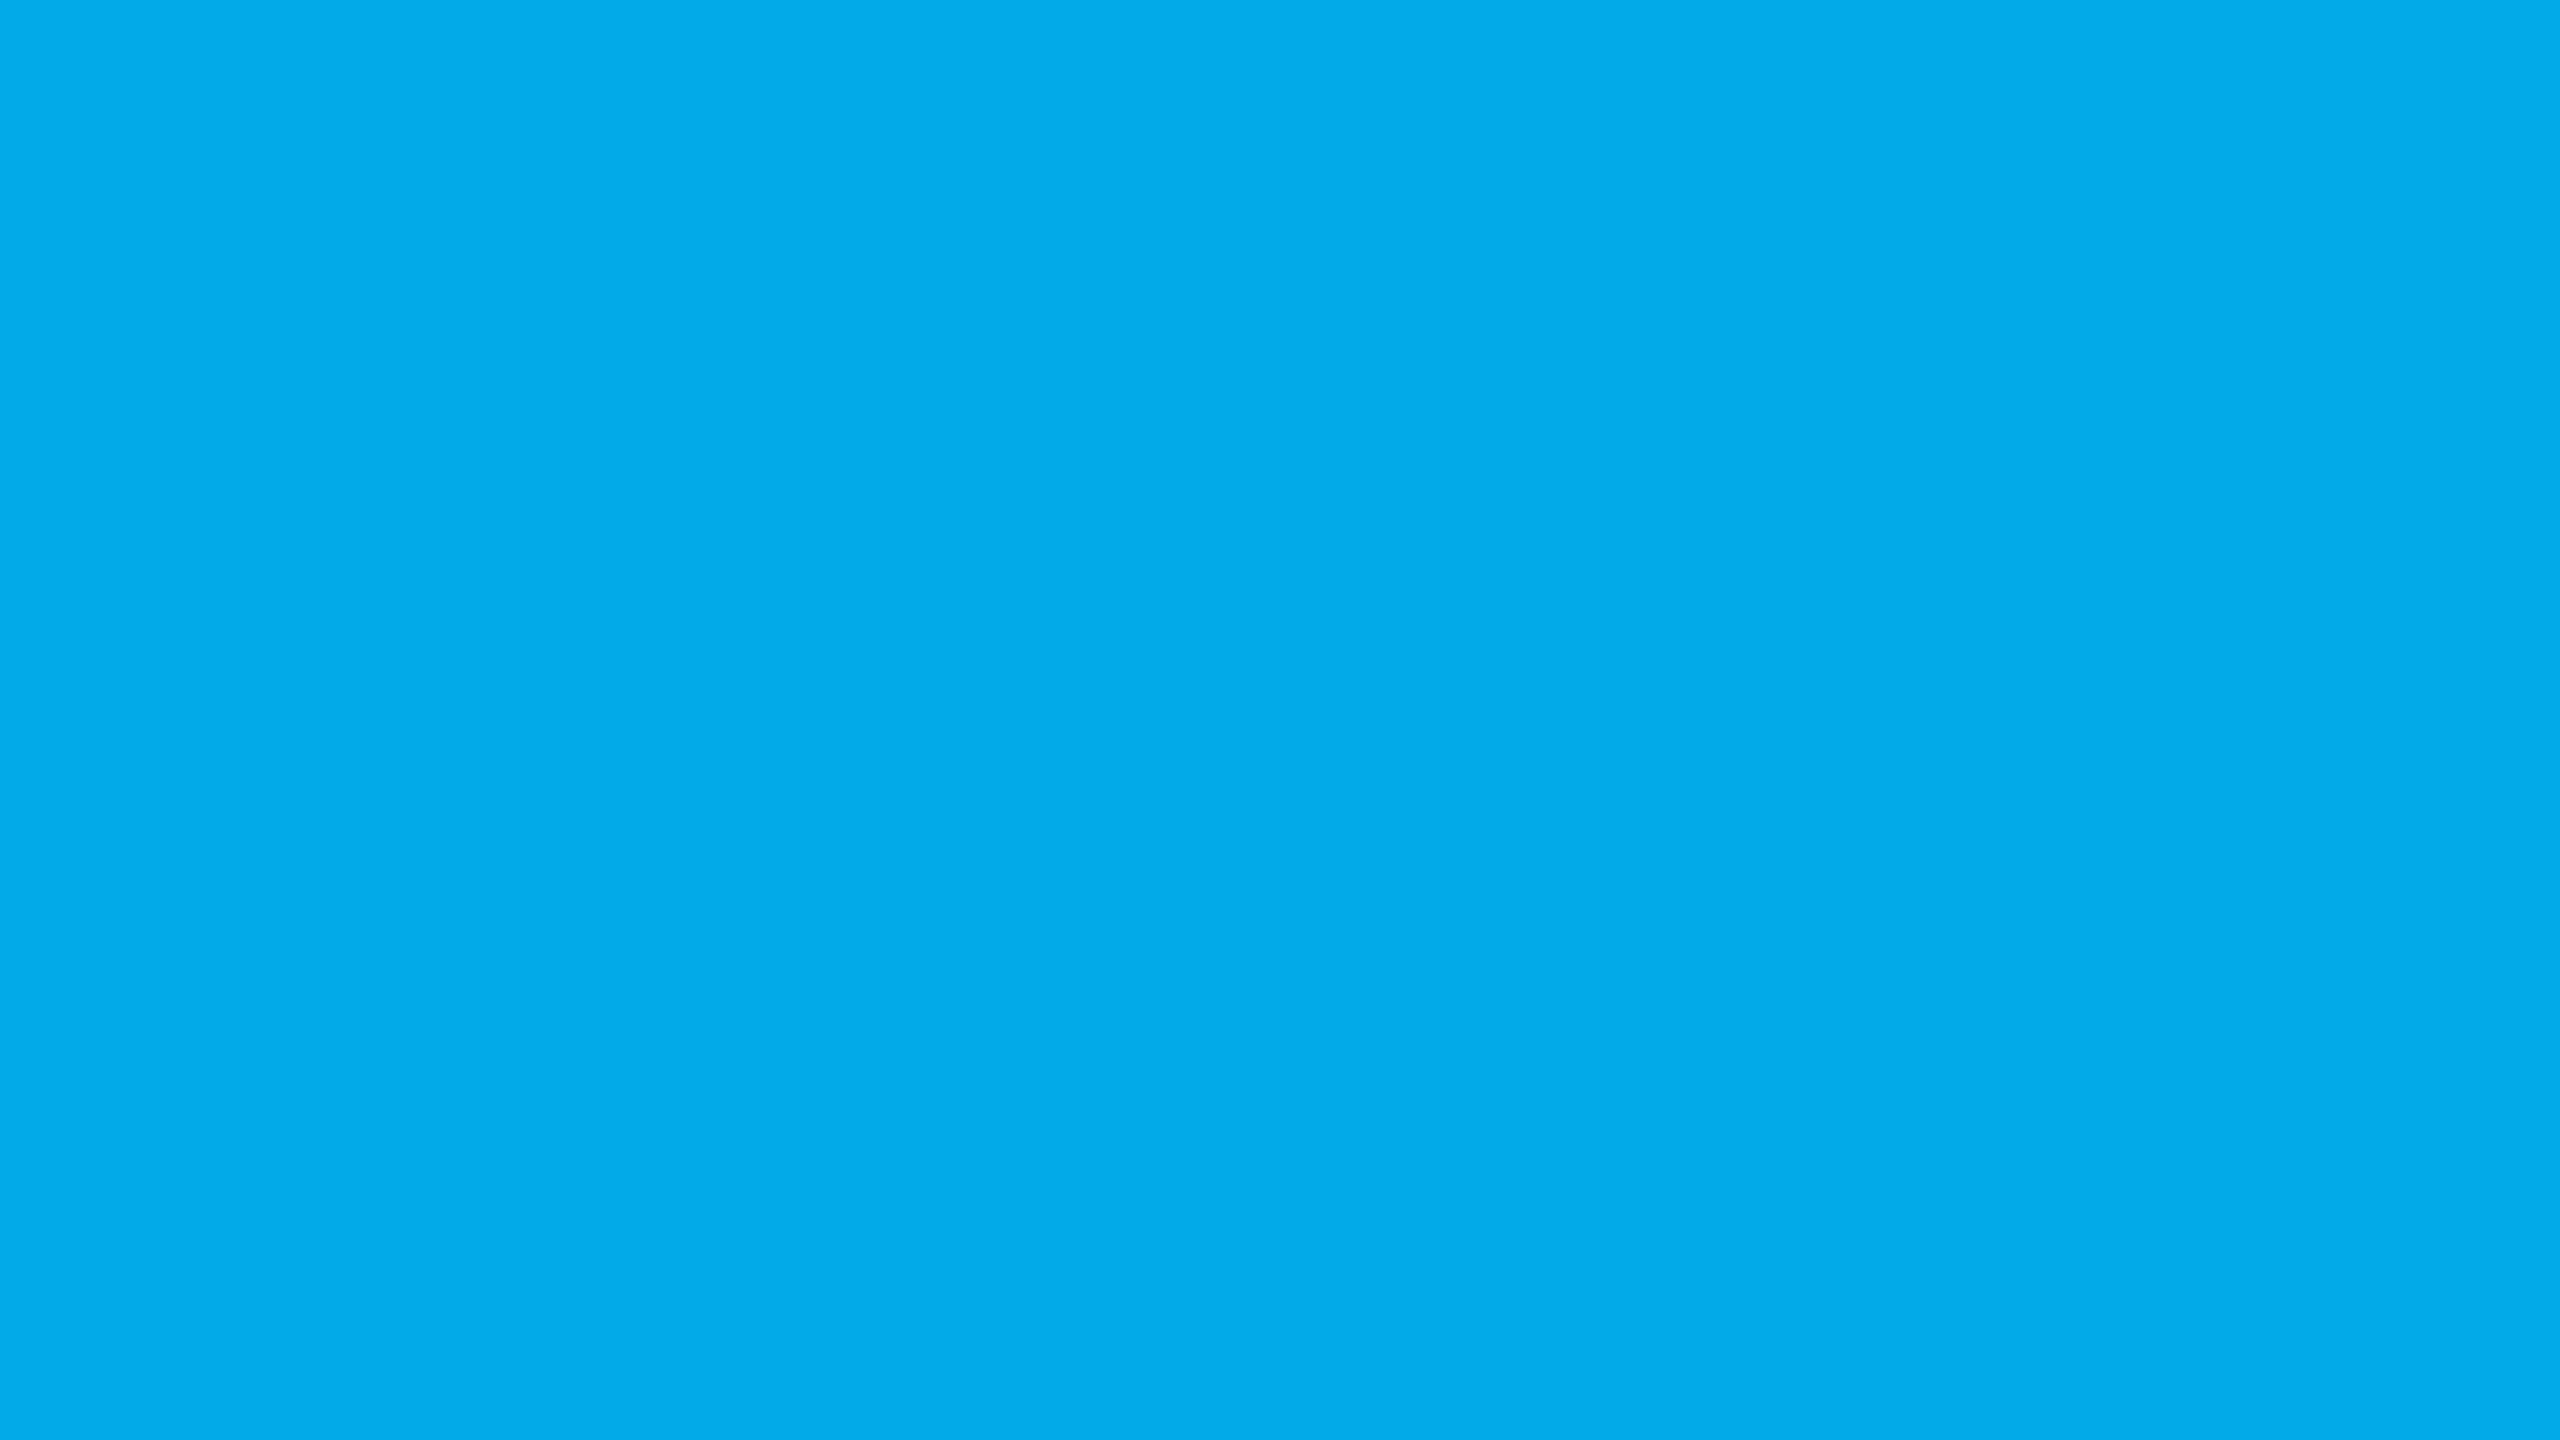 sky, color, background, solid, blue, spanish, wallpaper, images